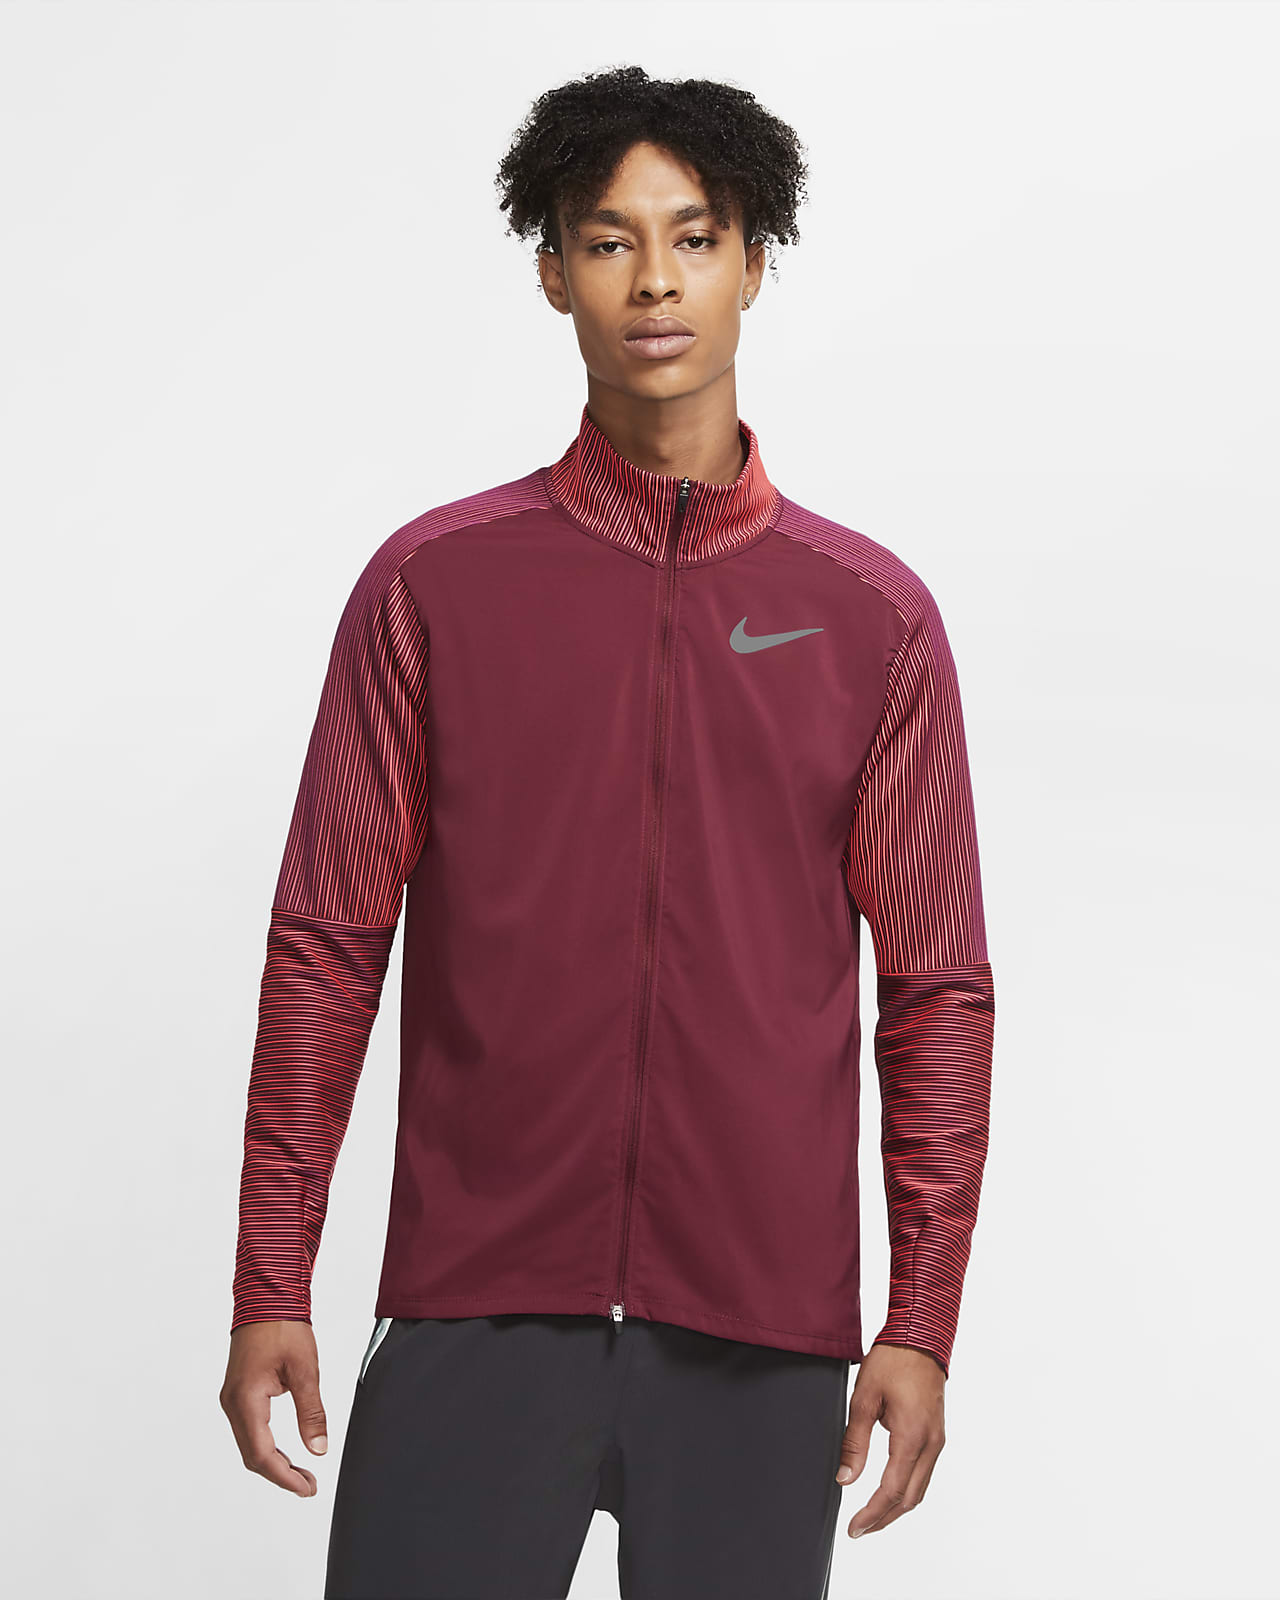 Nike Future Fast Camiseta de running híbrida - Hombre